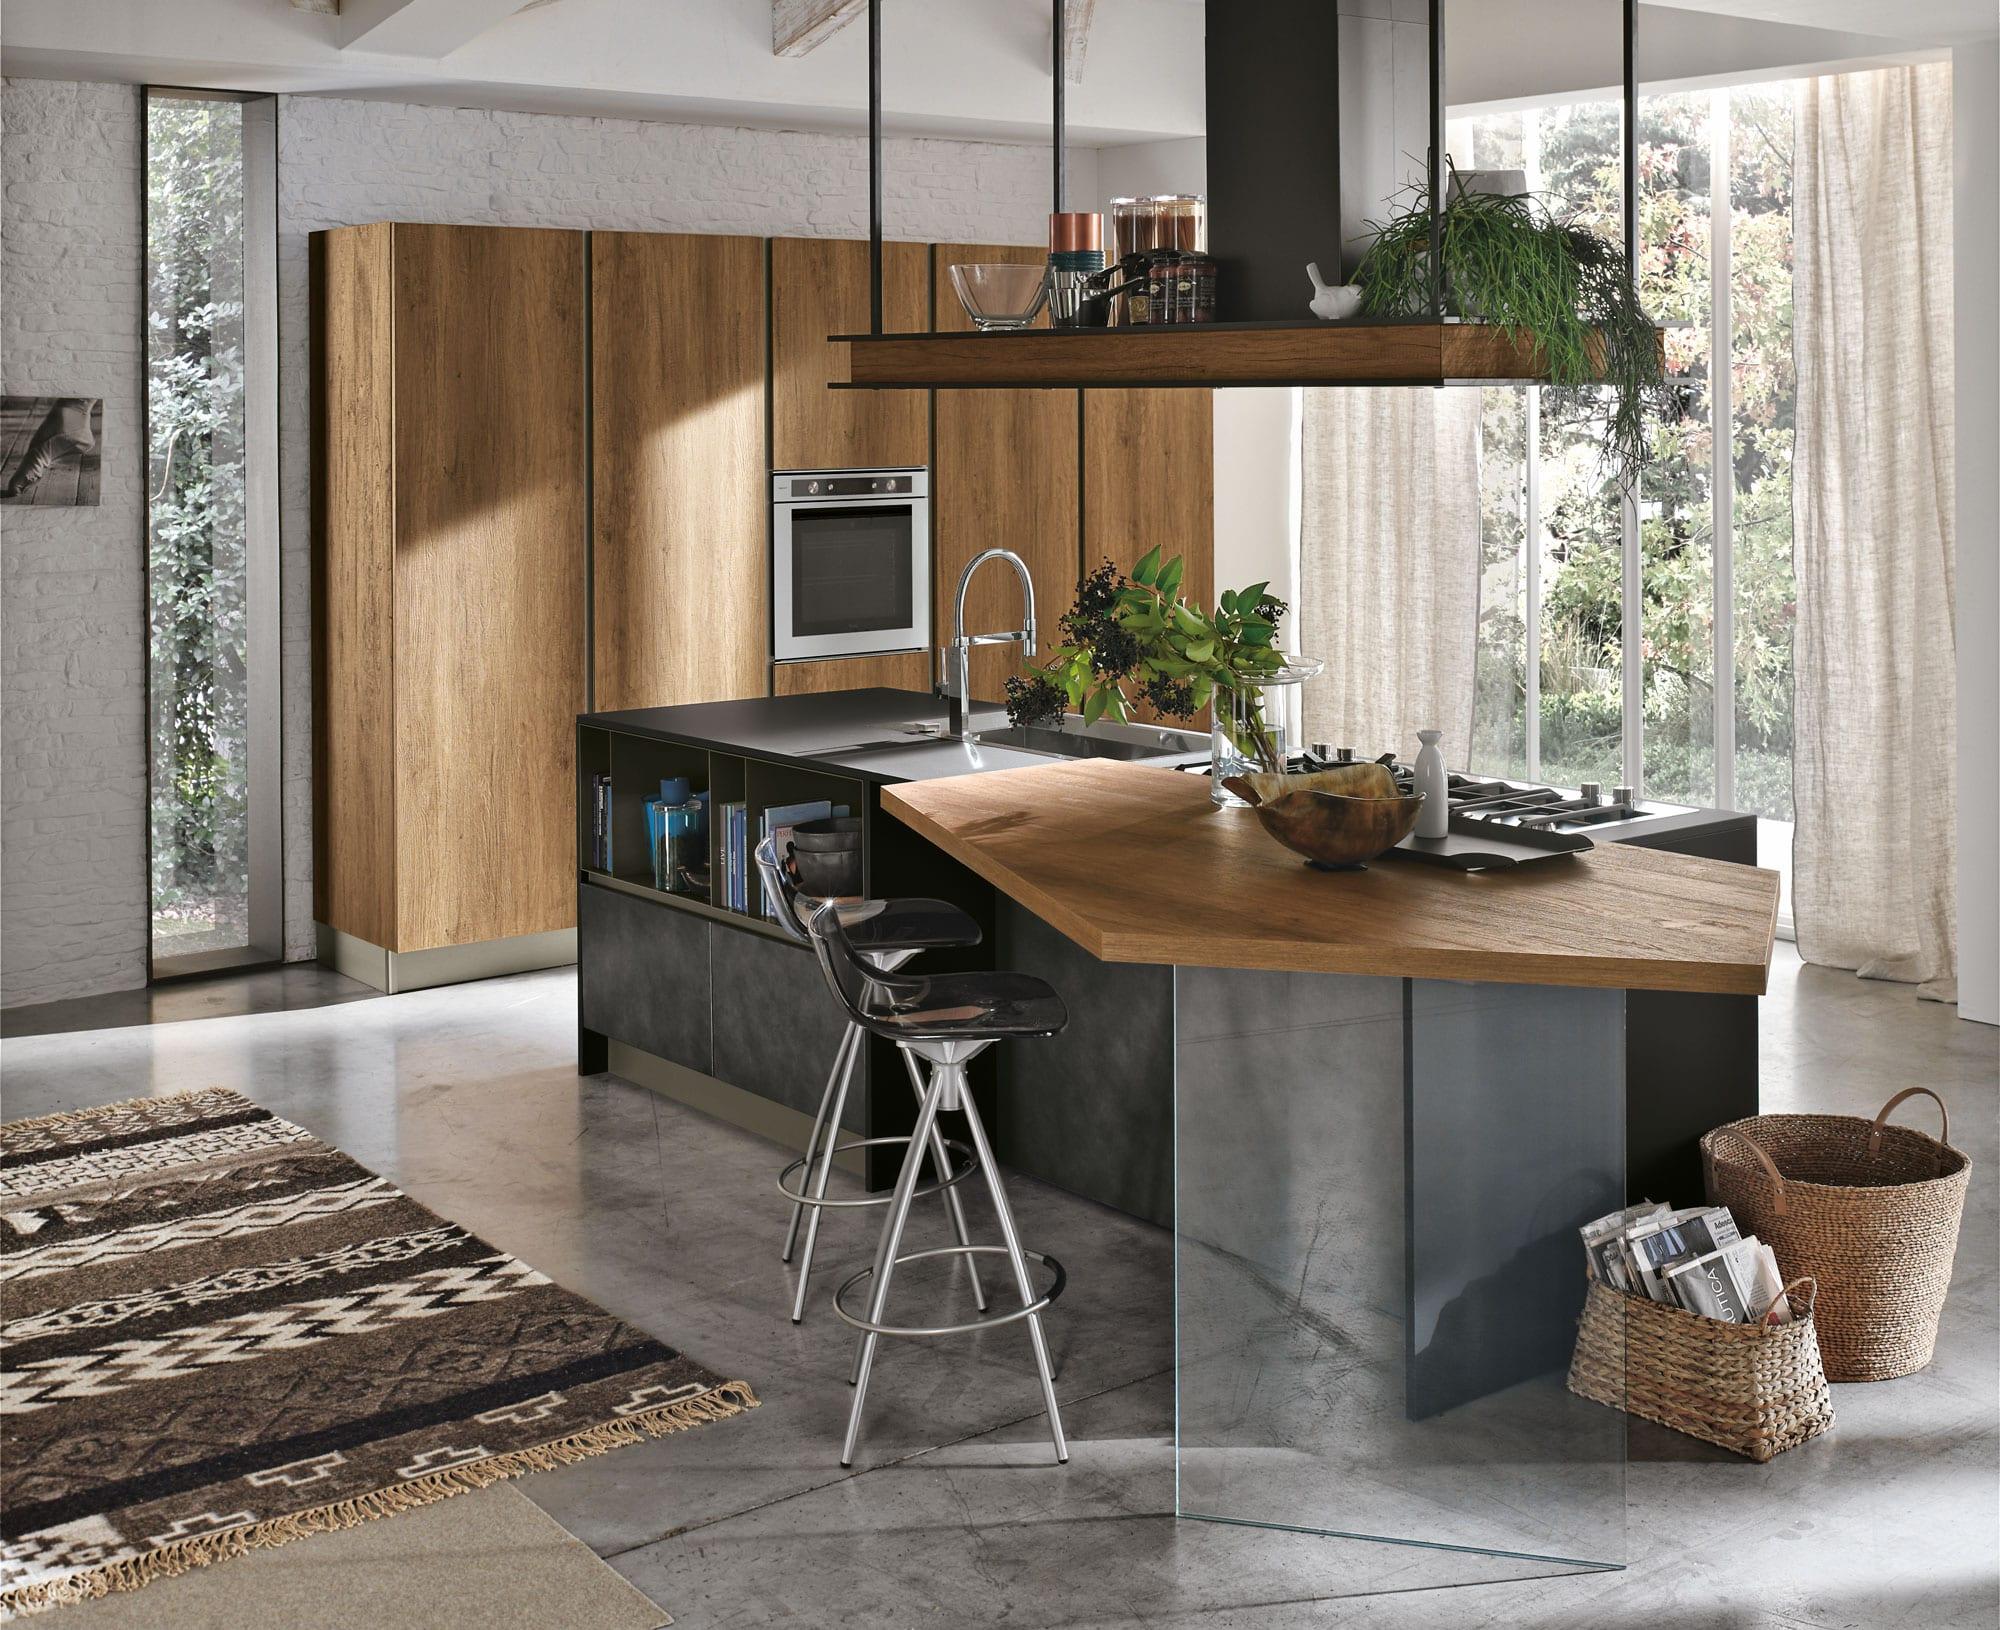 Cucina Raimondi Idee Casa